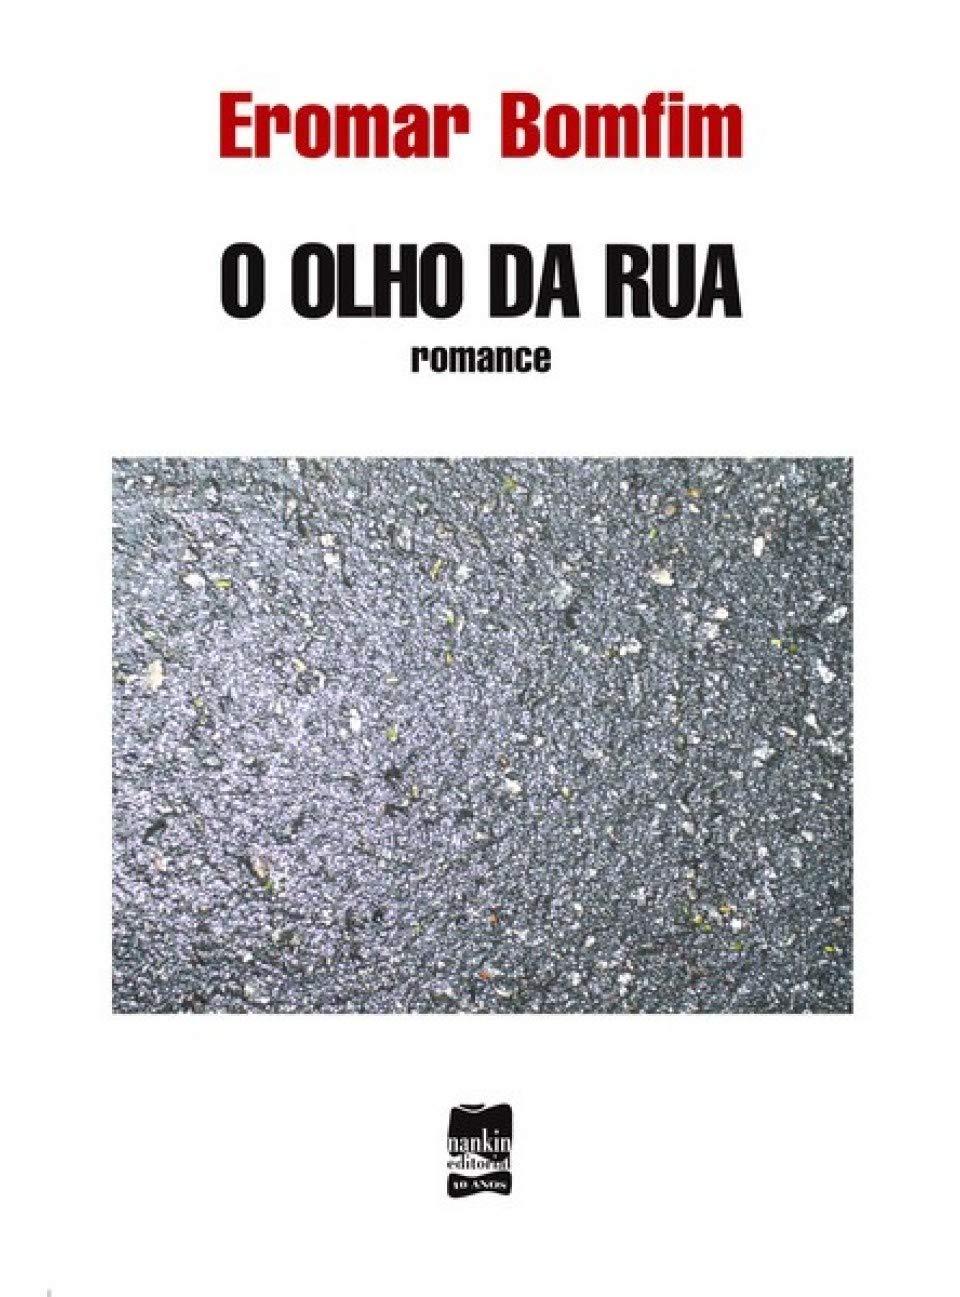 O Olho da rua - Livros na Amazon Brasil- 9788577510146